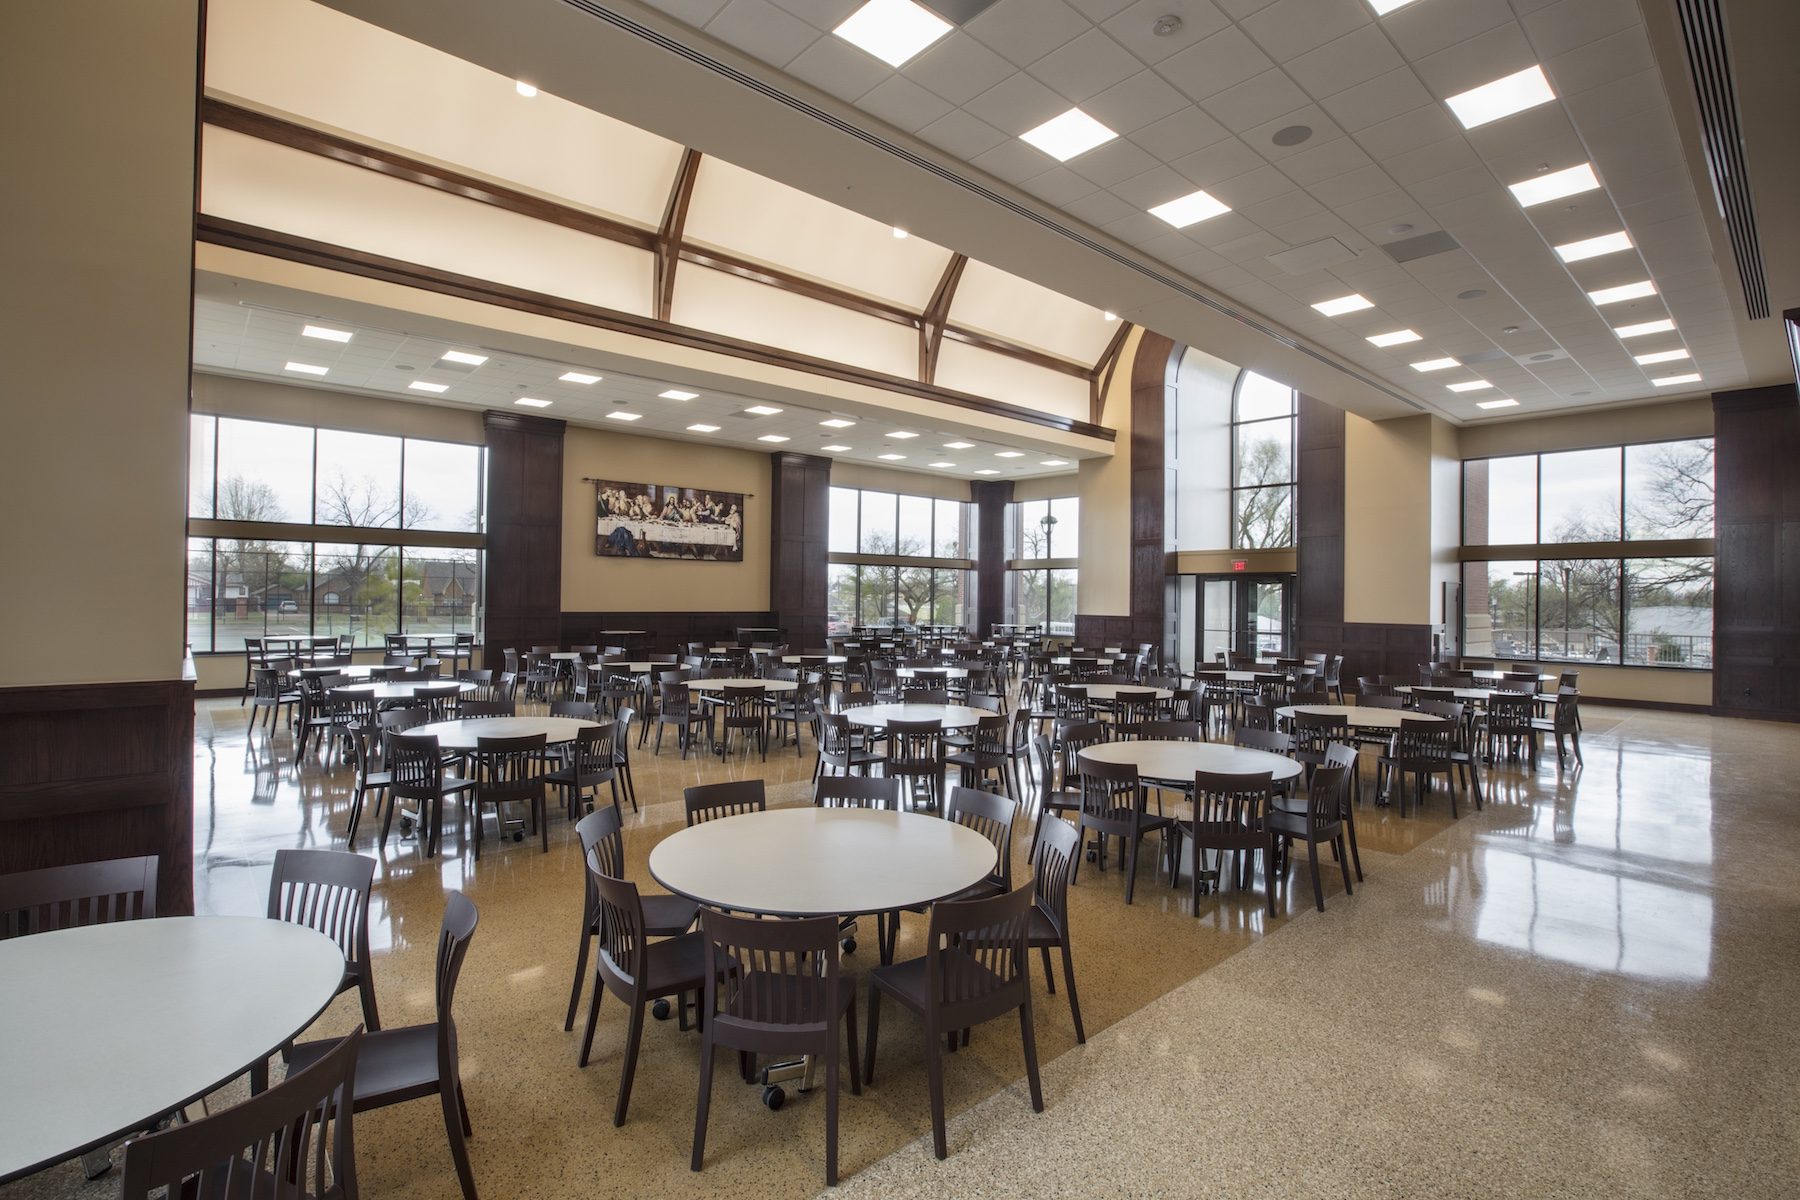 MSM cafeteria 1.jpg